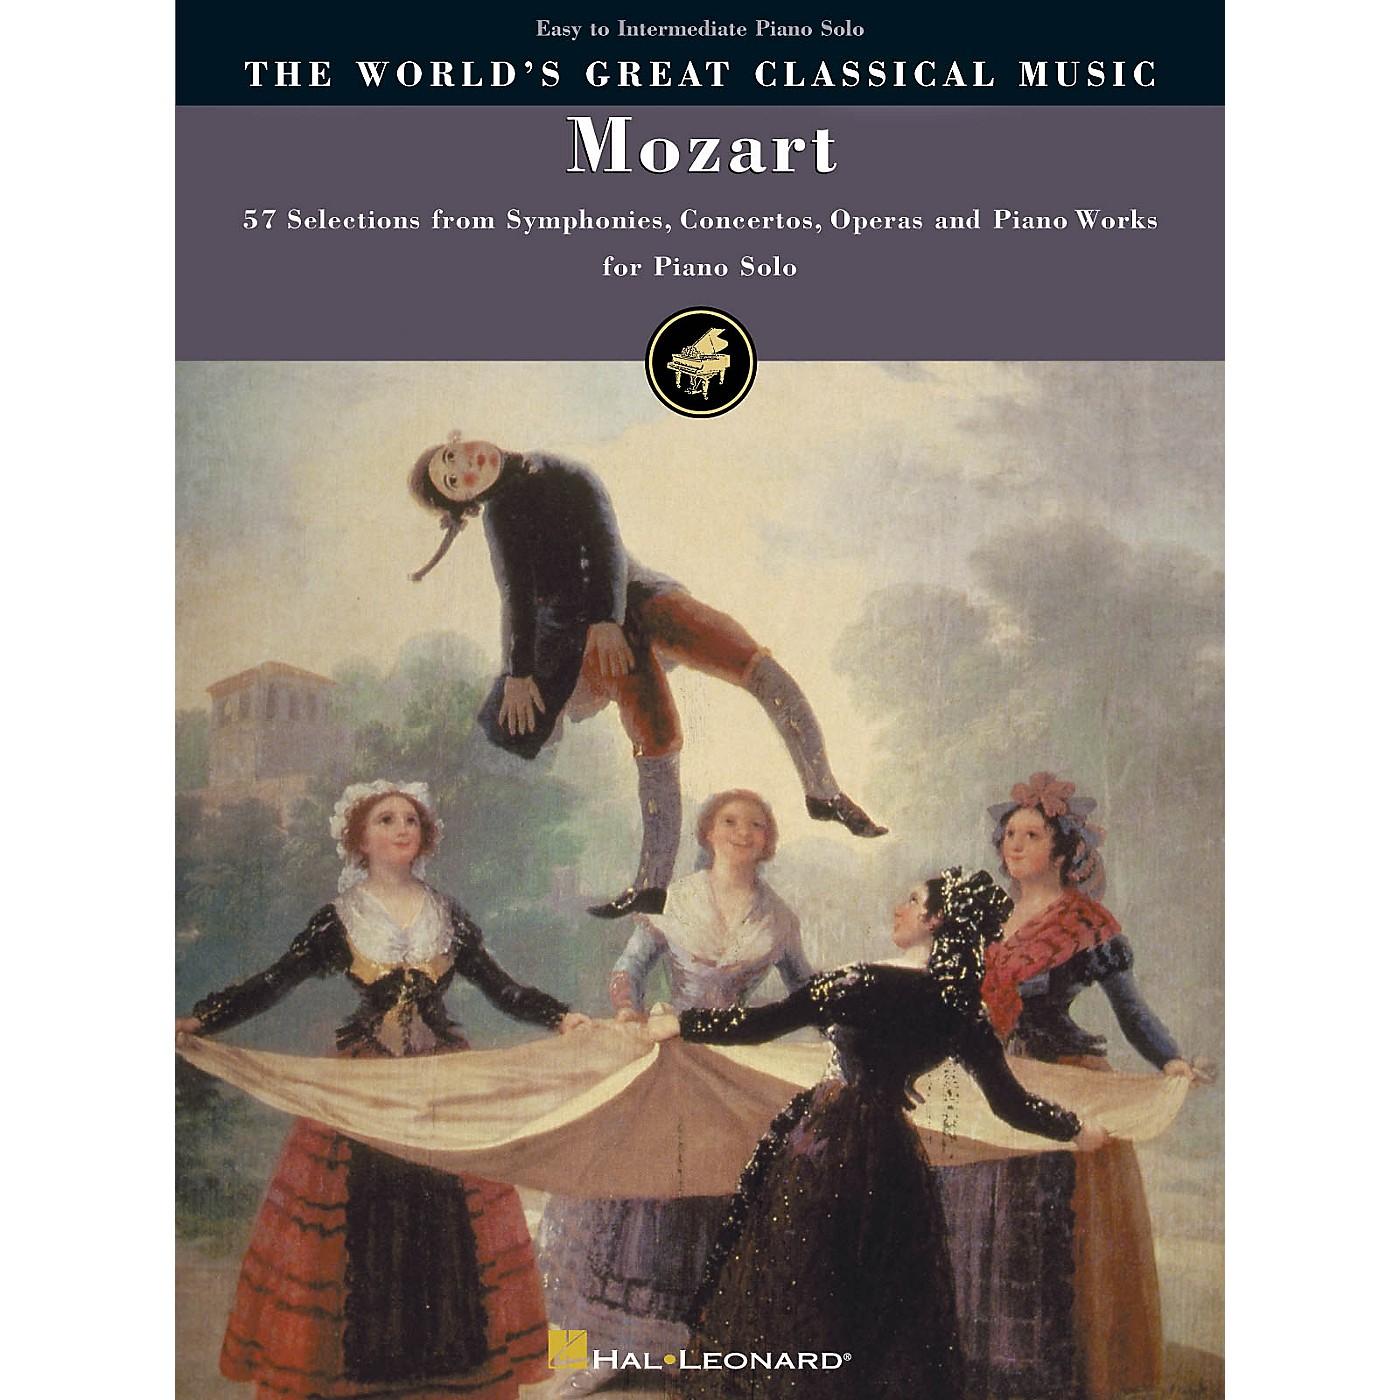 Hal Leonard Mozart - Simplified Piano Solos World's Greatest Classical Music Series (Intermediate) thumbnail